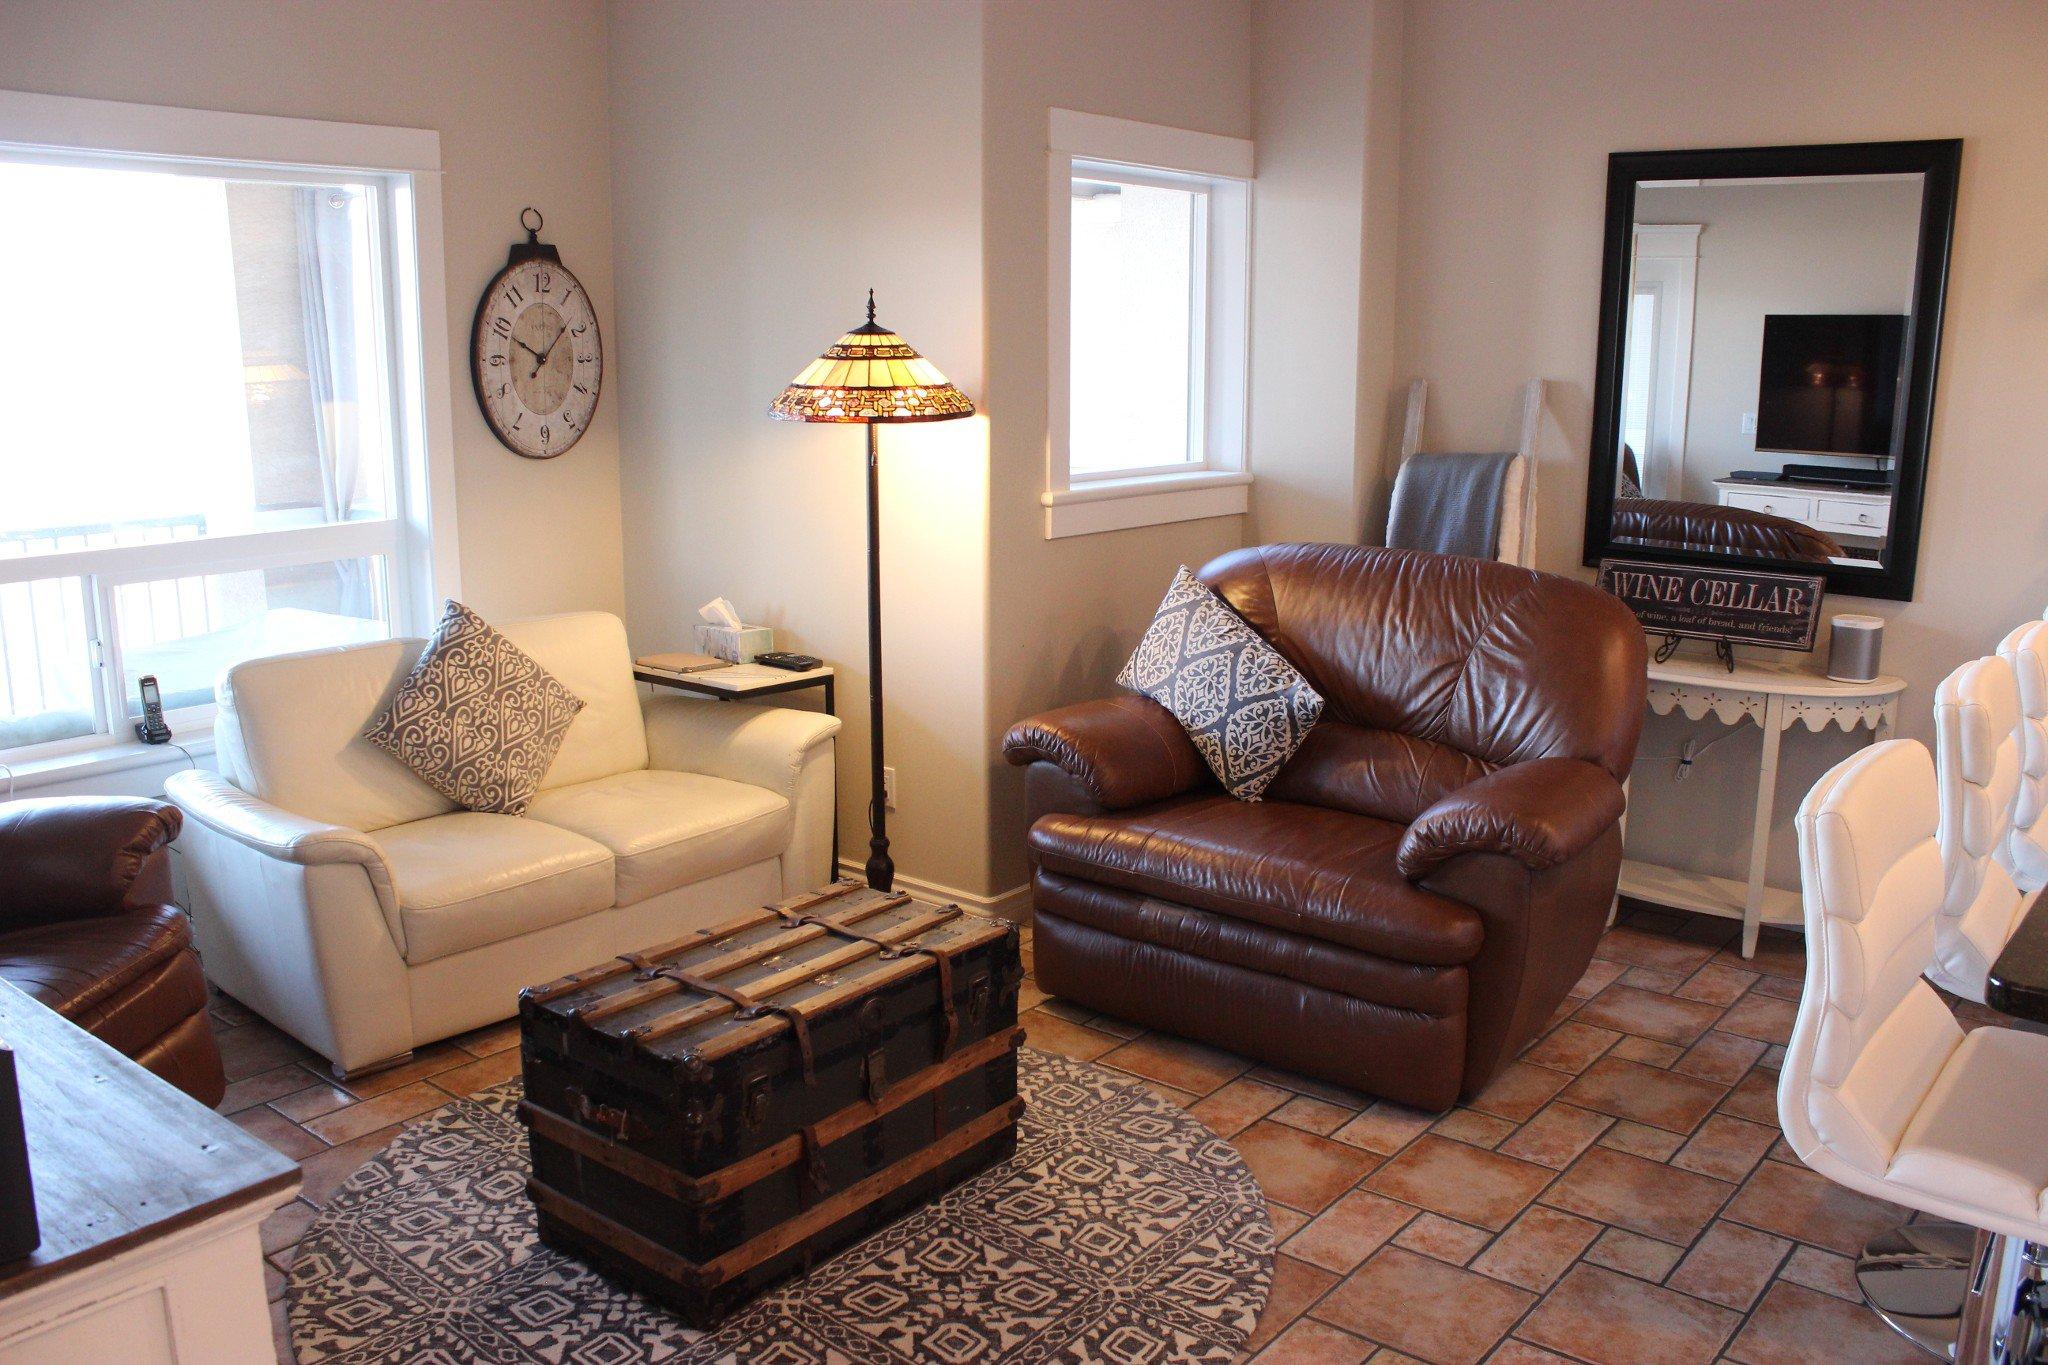 Photo 11: Photos: 101 875 Sahali Terrace in Kamloops: Lower Sahali Townhouse for sale : MLS®# 154556